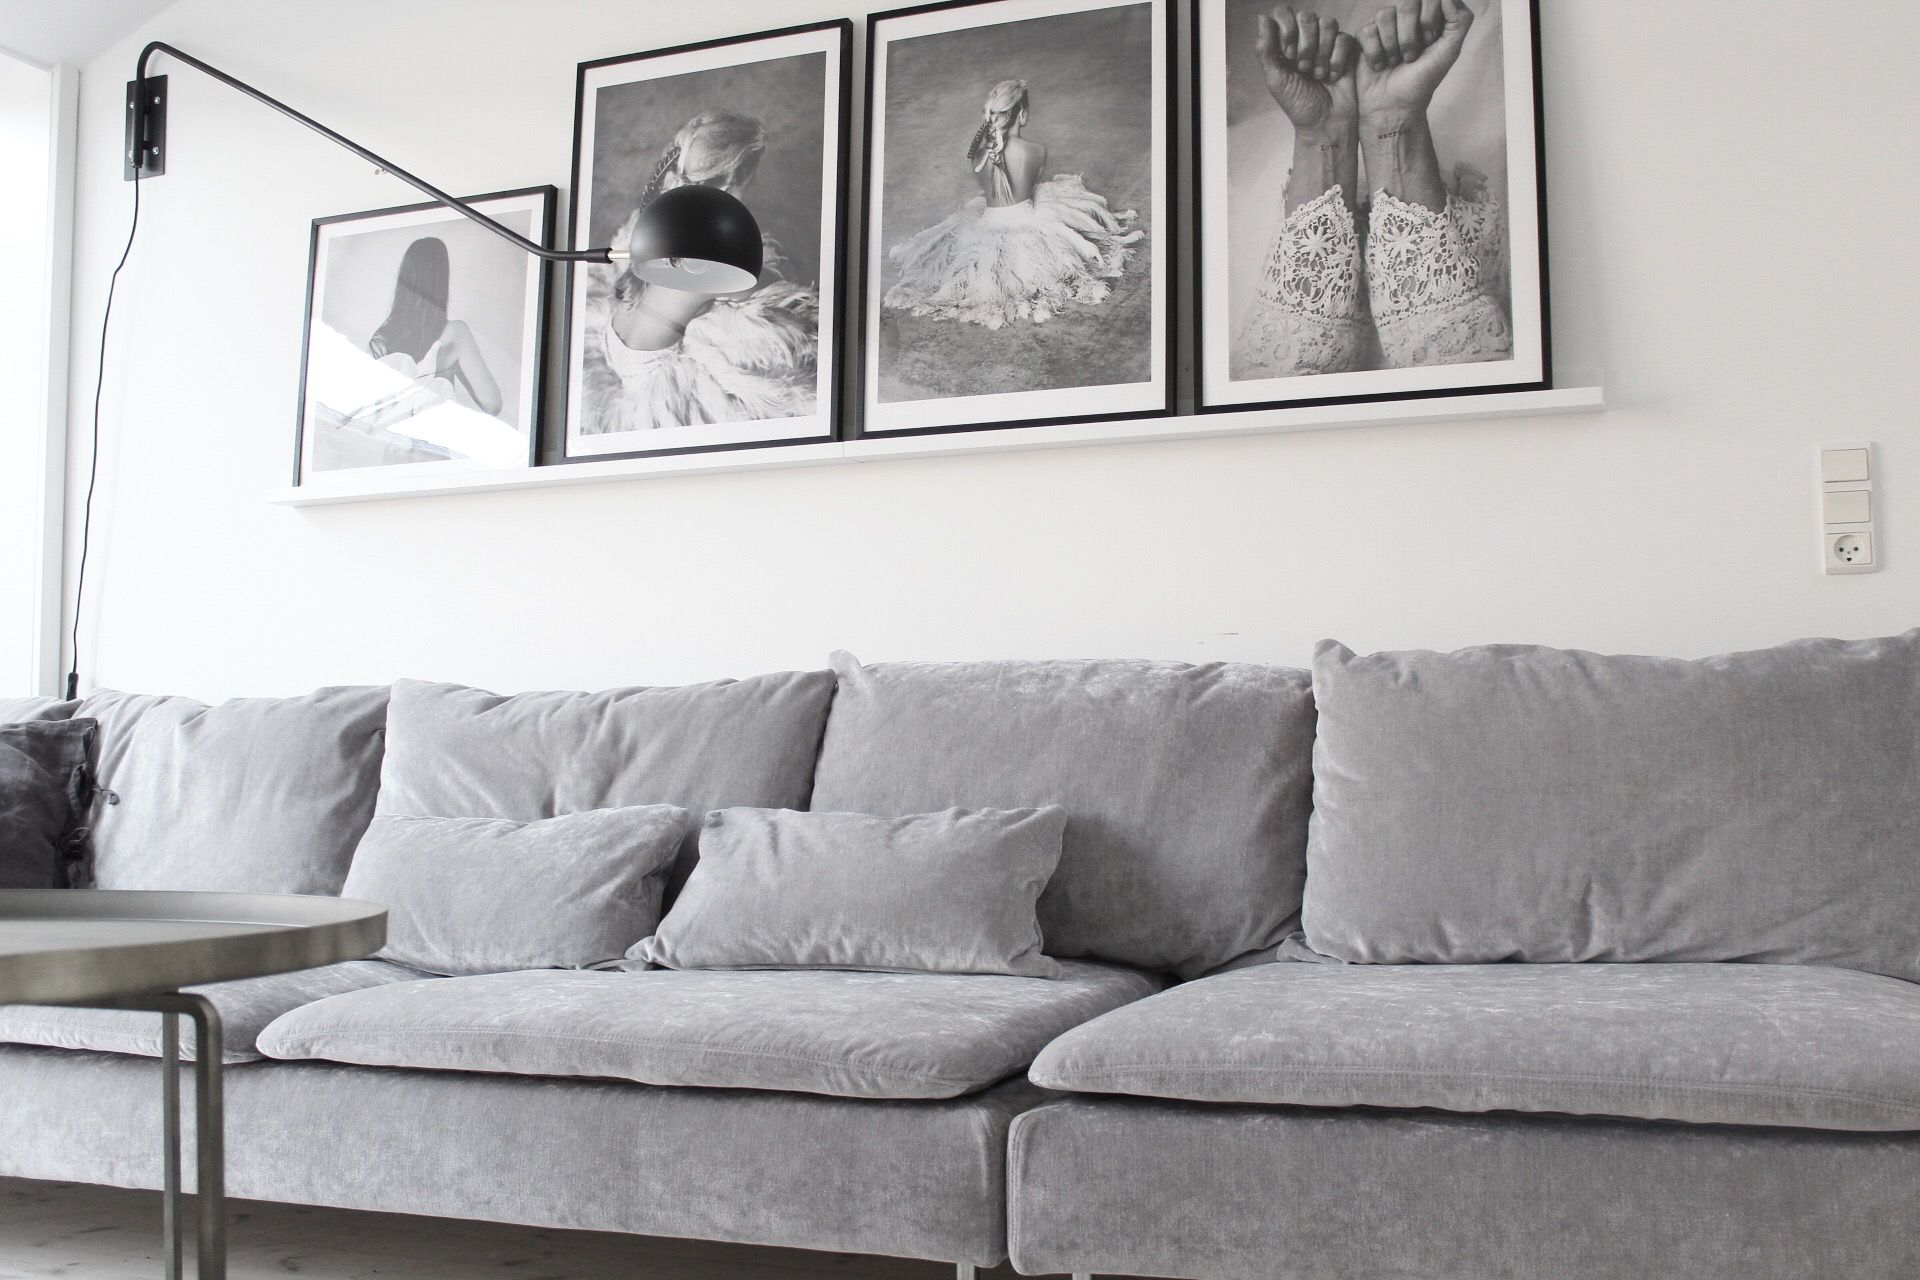 Gray Velvet Slipcover Sofa Karlstad And Chaise Lounge Söderhamn 3 Seat Section Cover U R B A N I T E S